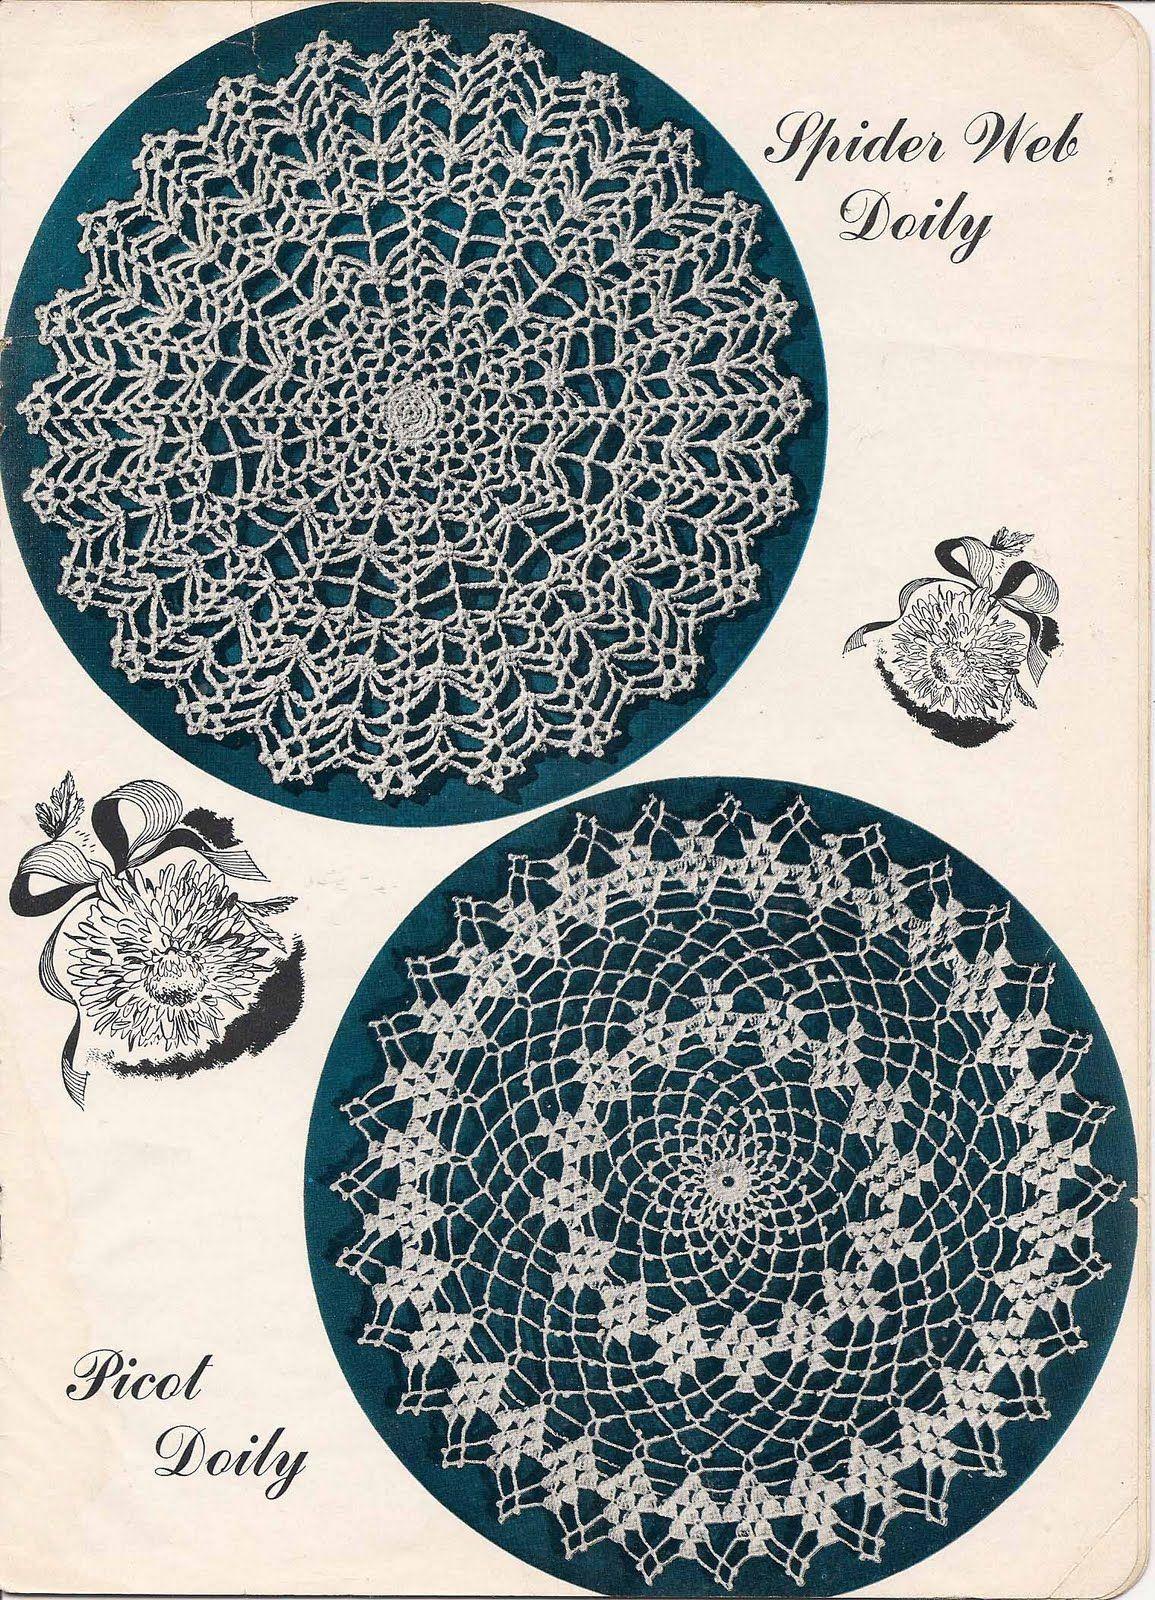 Free Crochet Patterns to Print | free crochet spider web doily ...